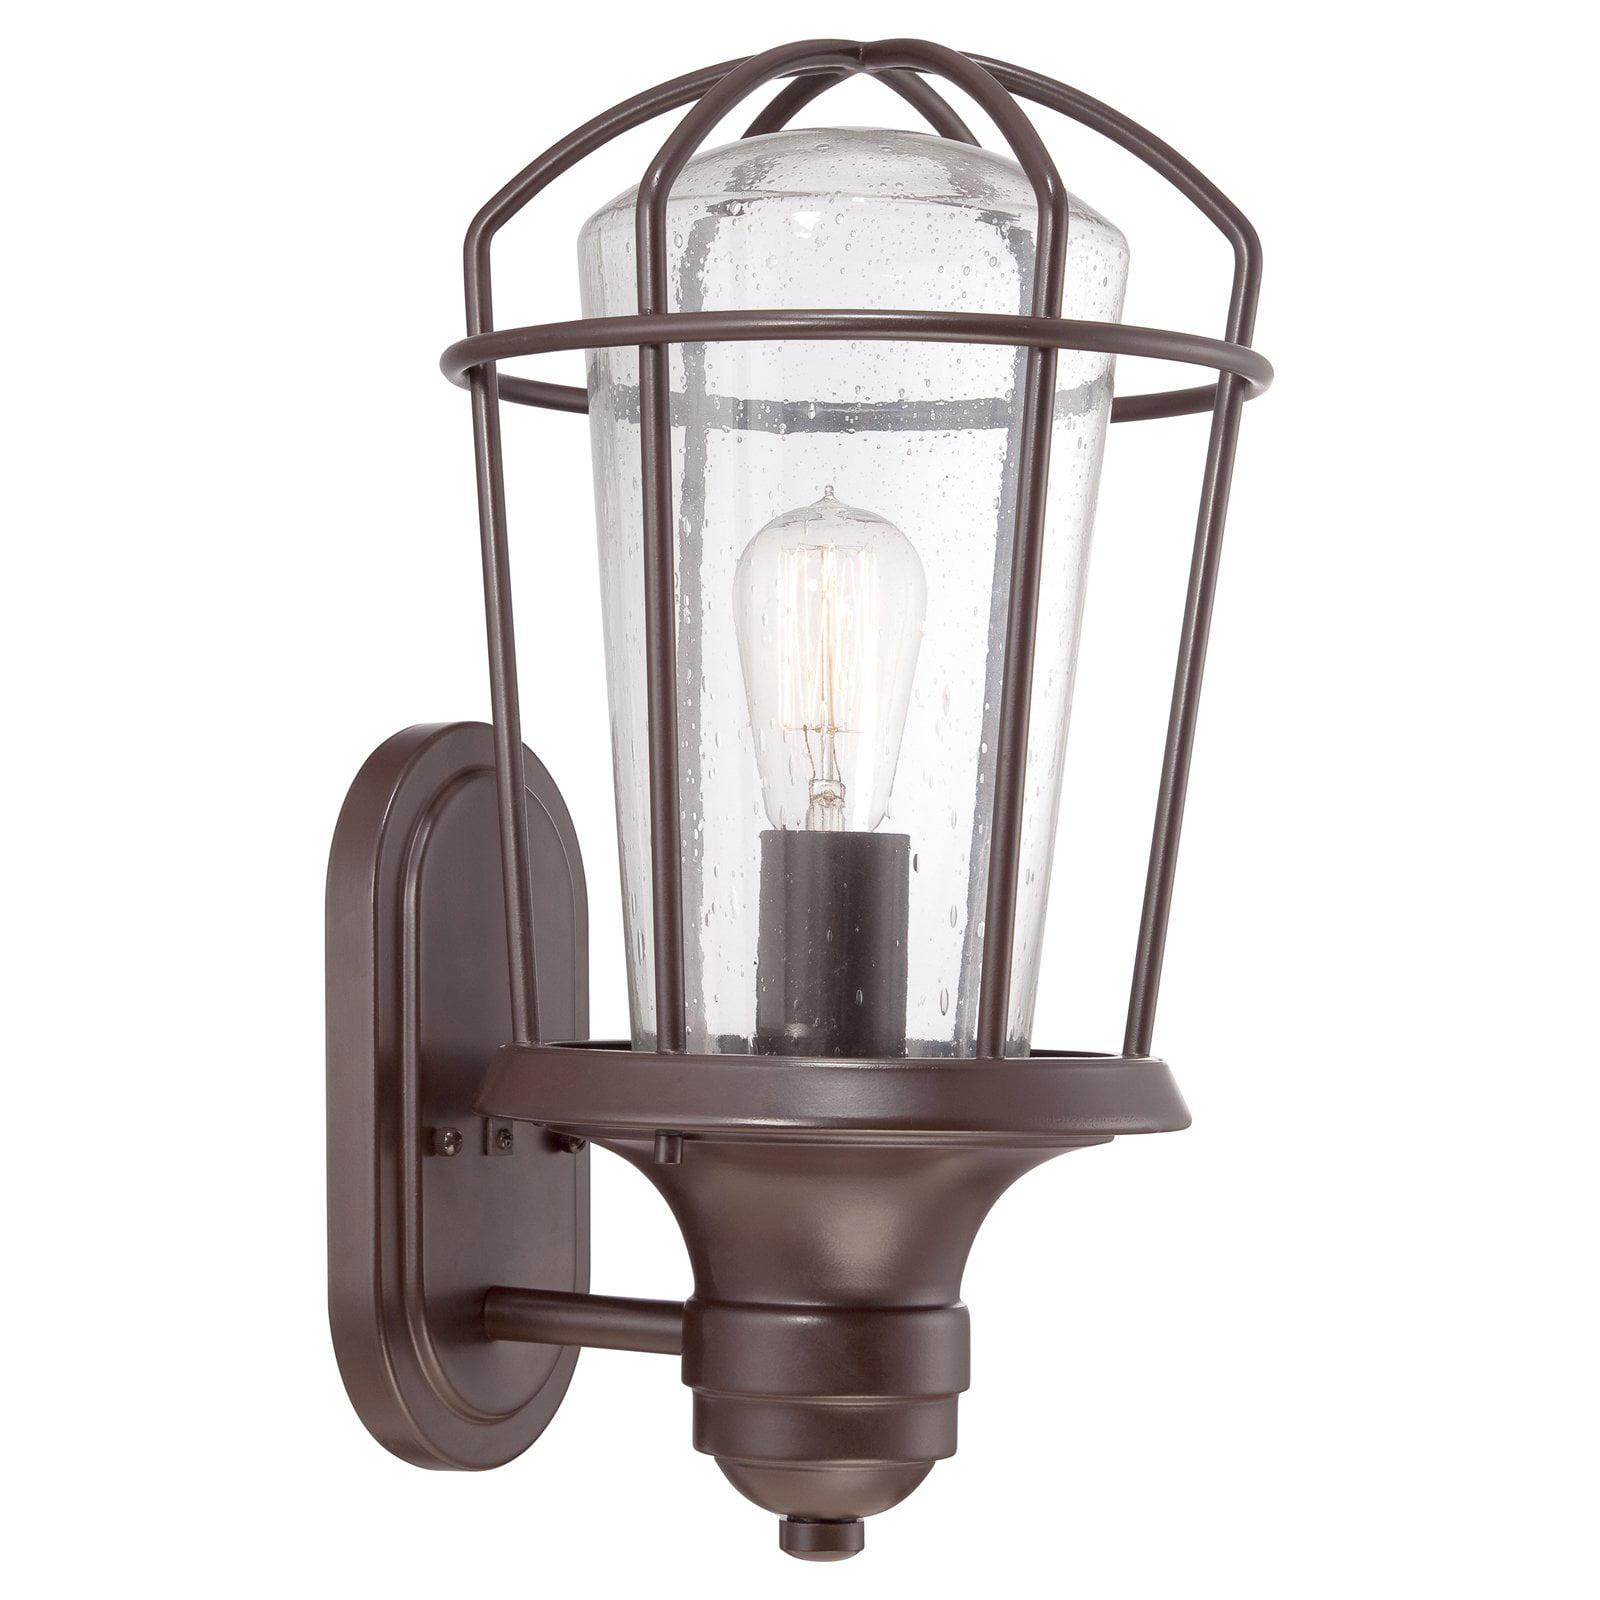 Quoizel Marine MRE8409WT Outdoor Wall Lantern